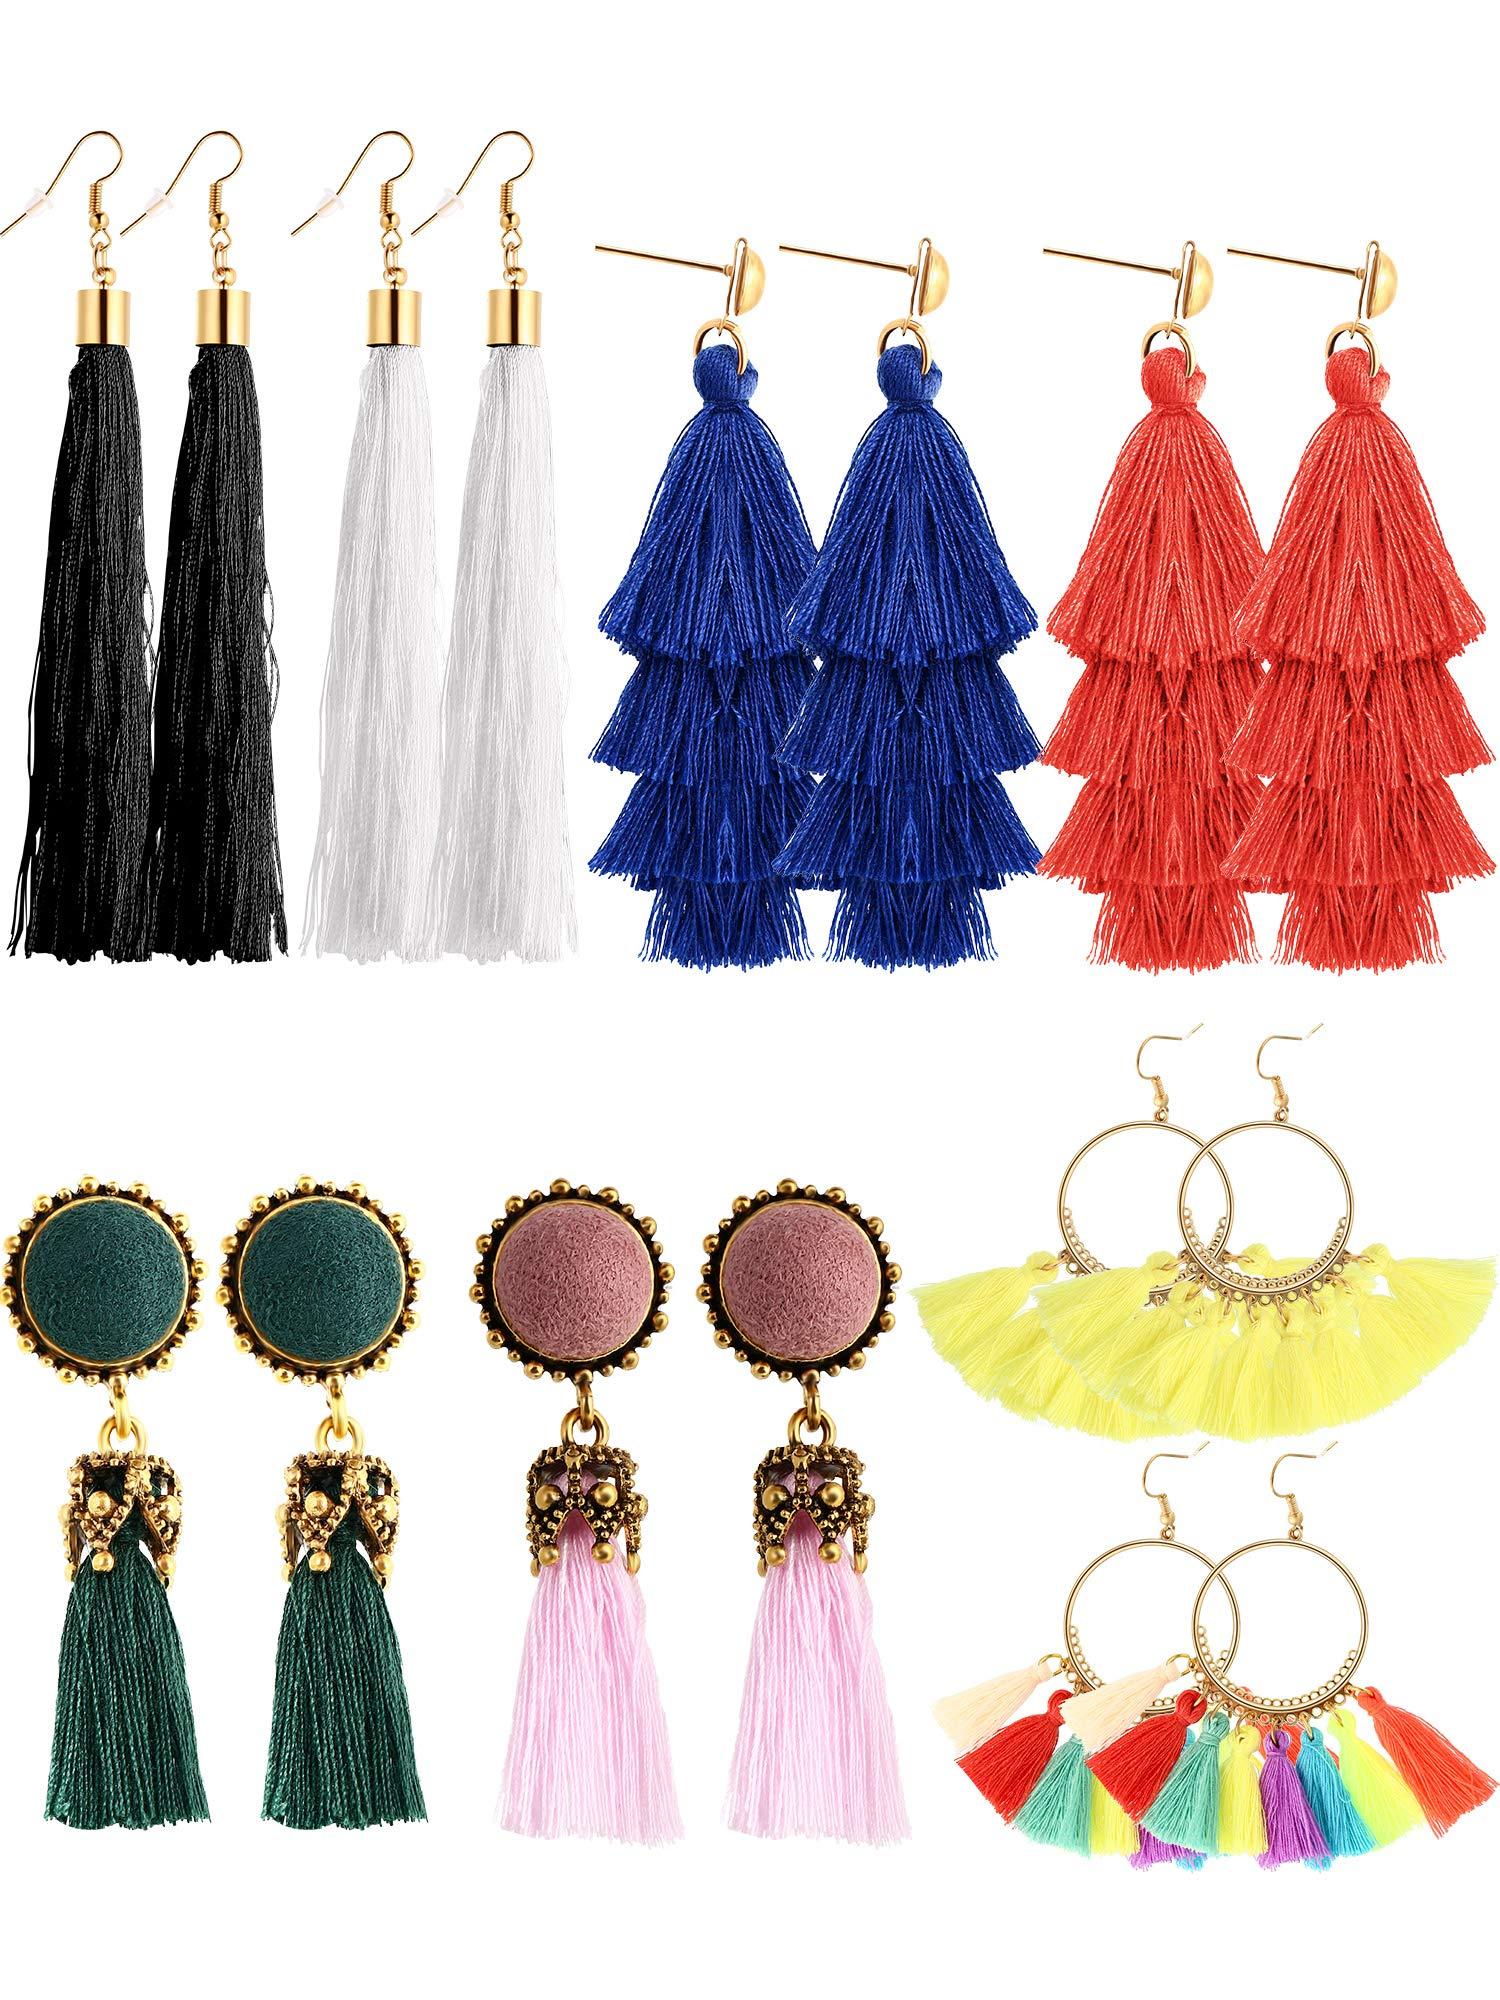 Tatuo 8 Pairs Tassel Earrings Thread Tassel Dangle Earrings Tiered Dangle Earrings Fringe Drop for Women Girls, 4 Styles and 8 Colors